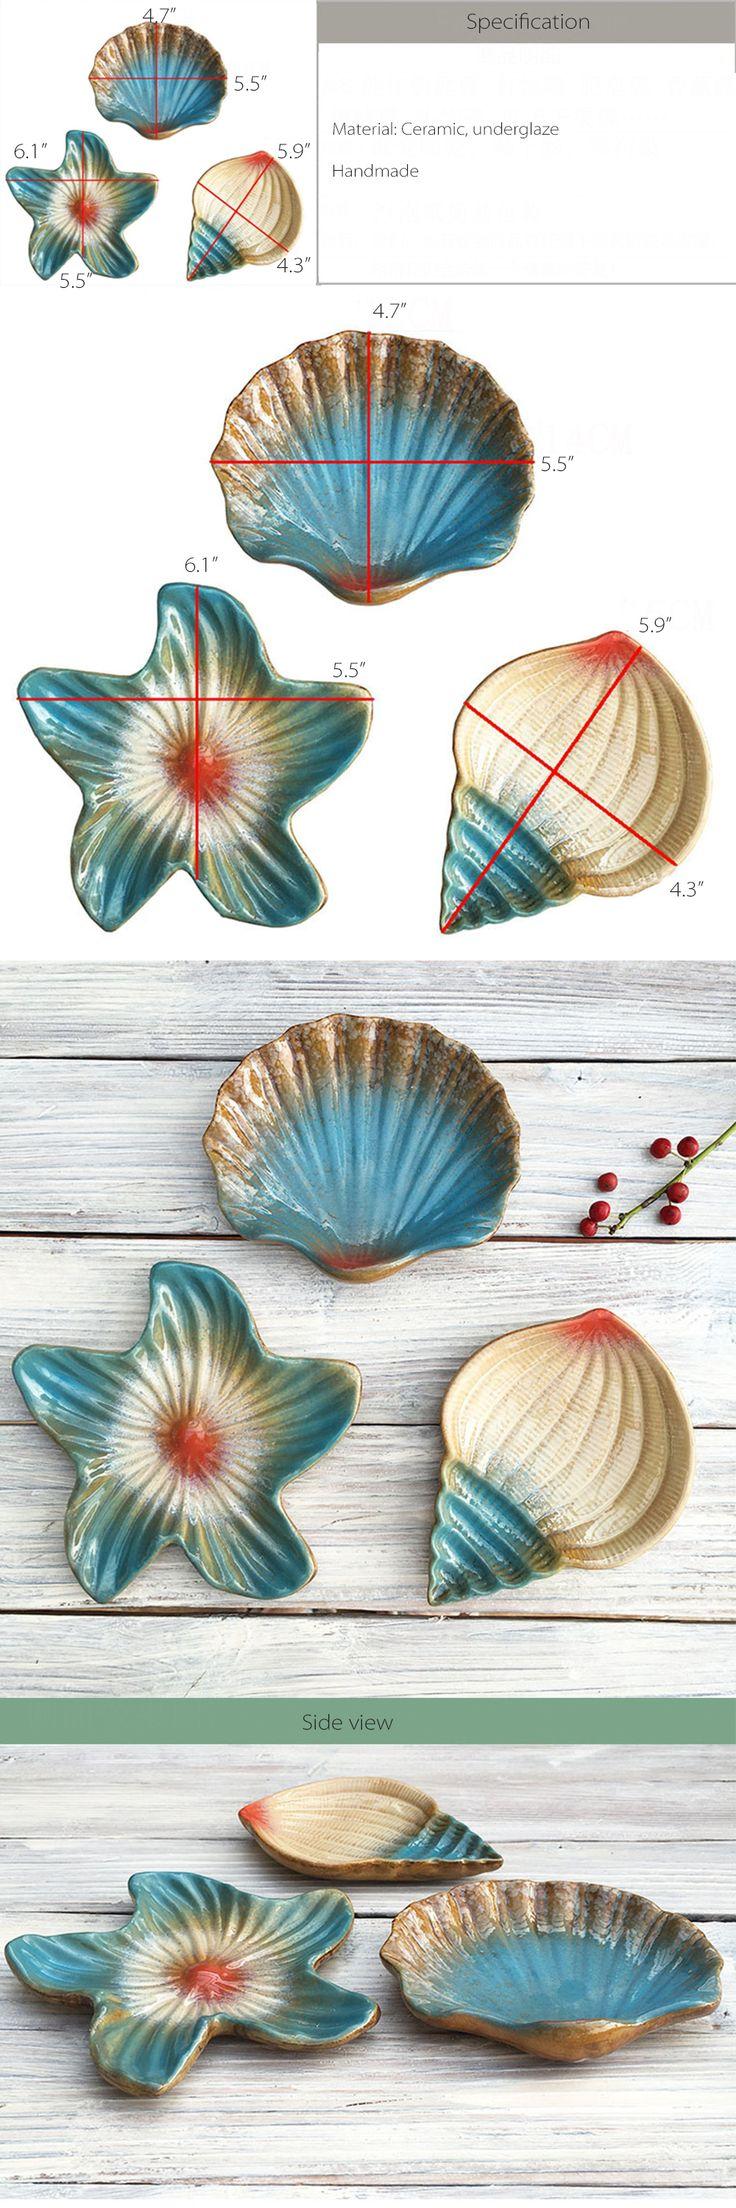 White beach print home decor fabric decorative seashell bty ebay - Seashell Ceramic Dishes